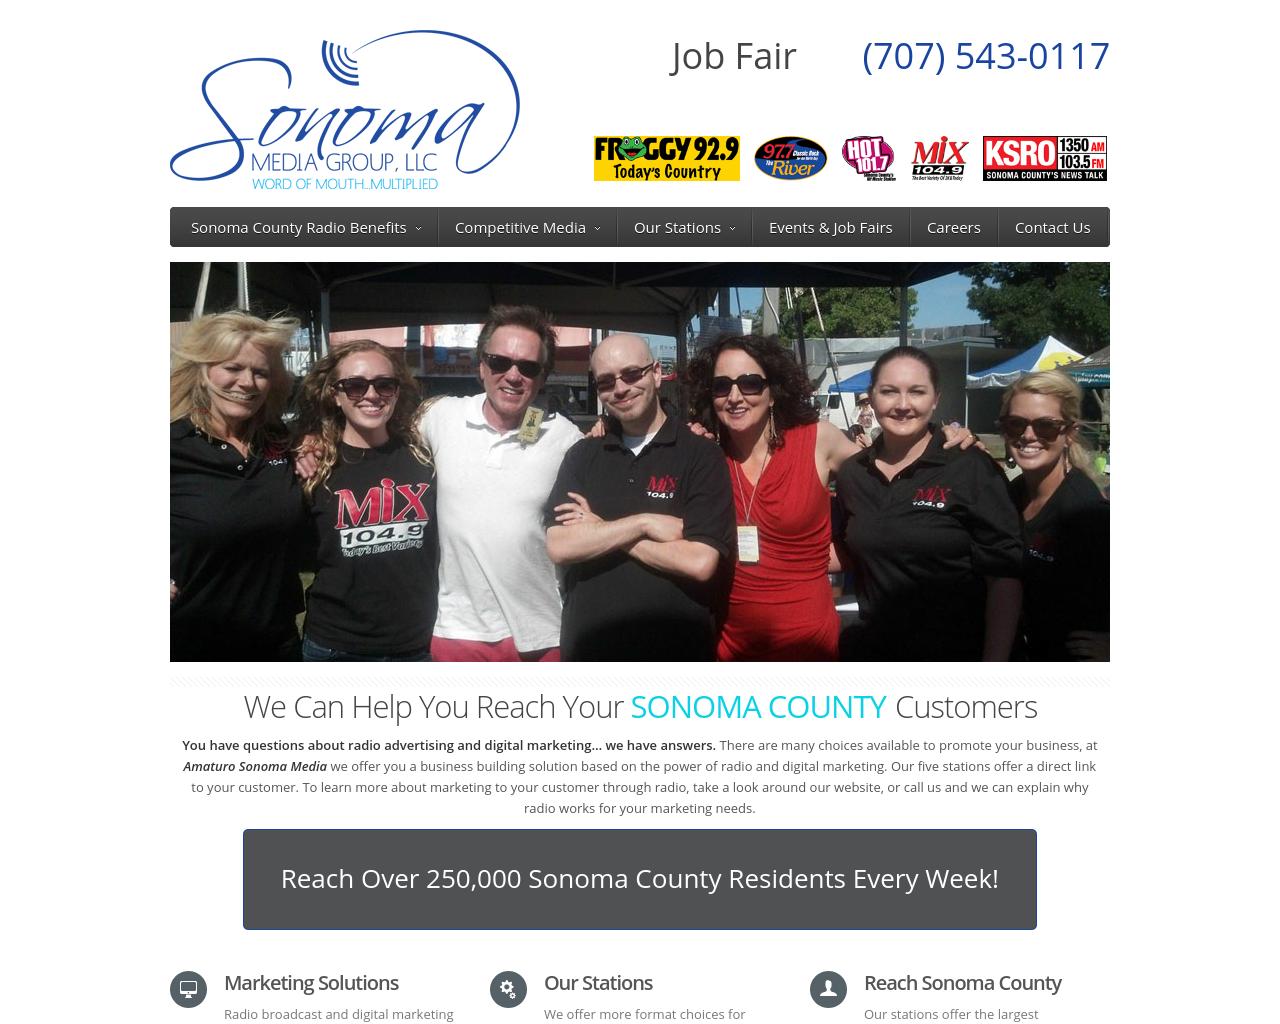 Sonoma-Media-Group-Advertising-Reviews-Pricing